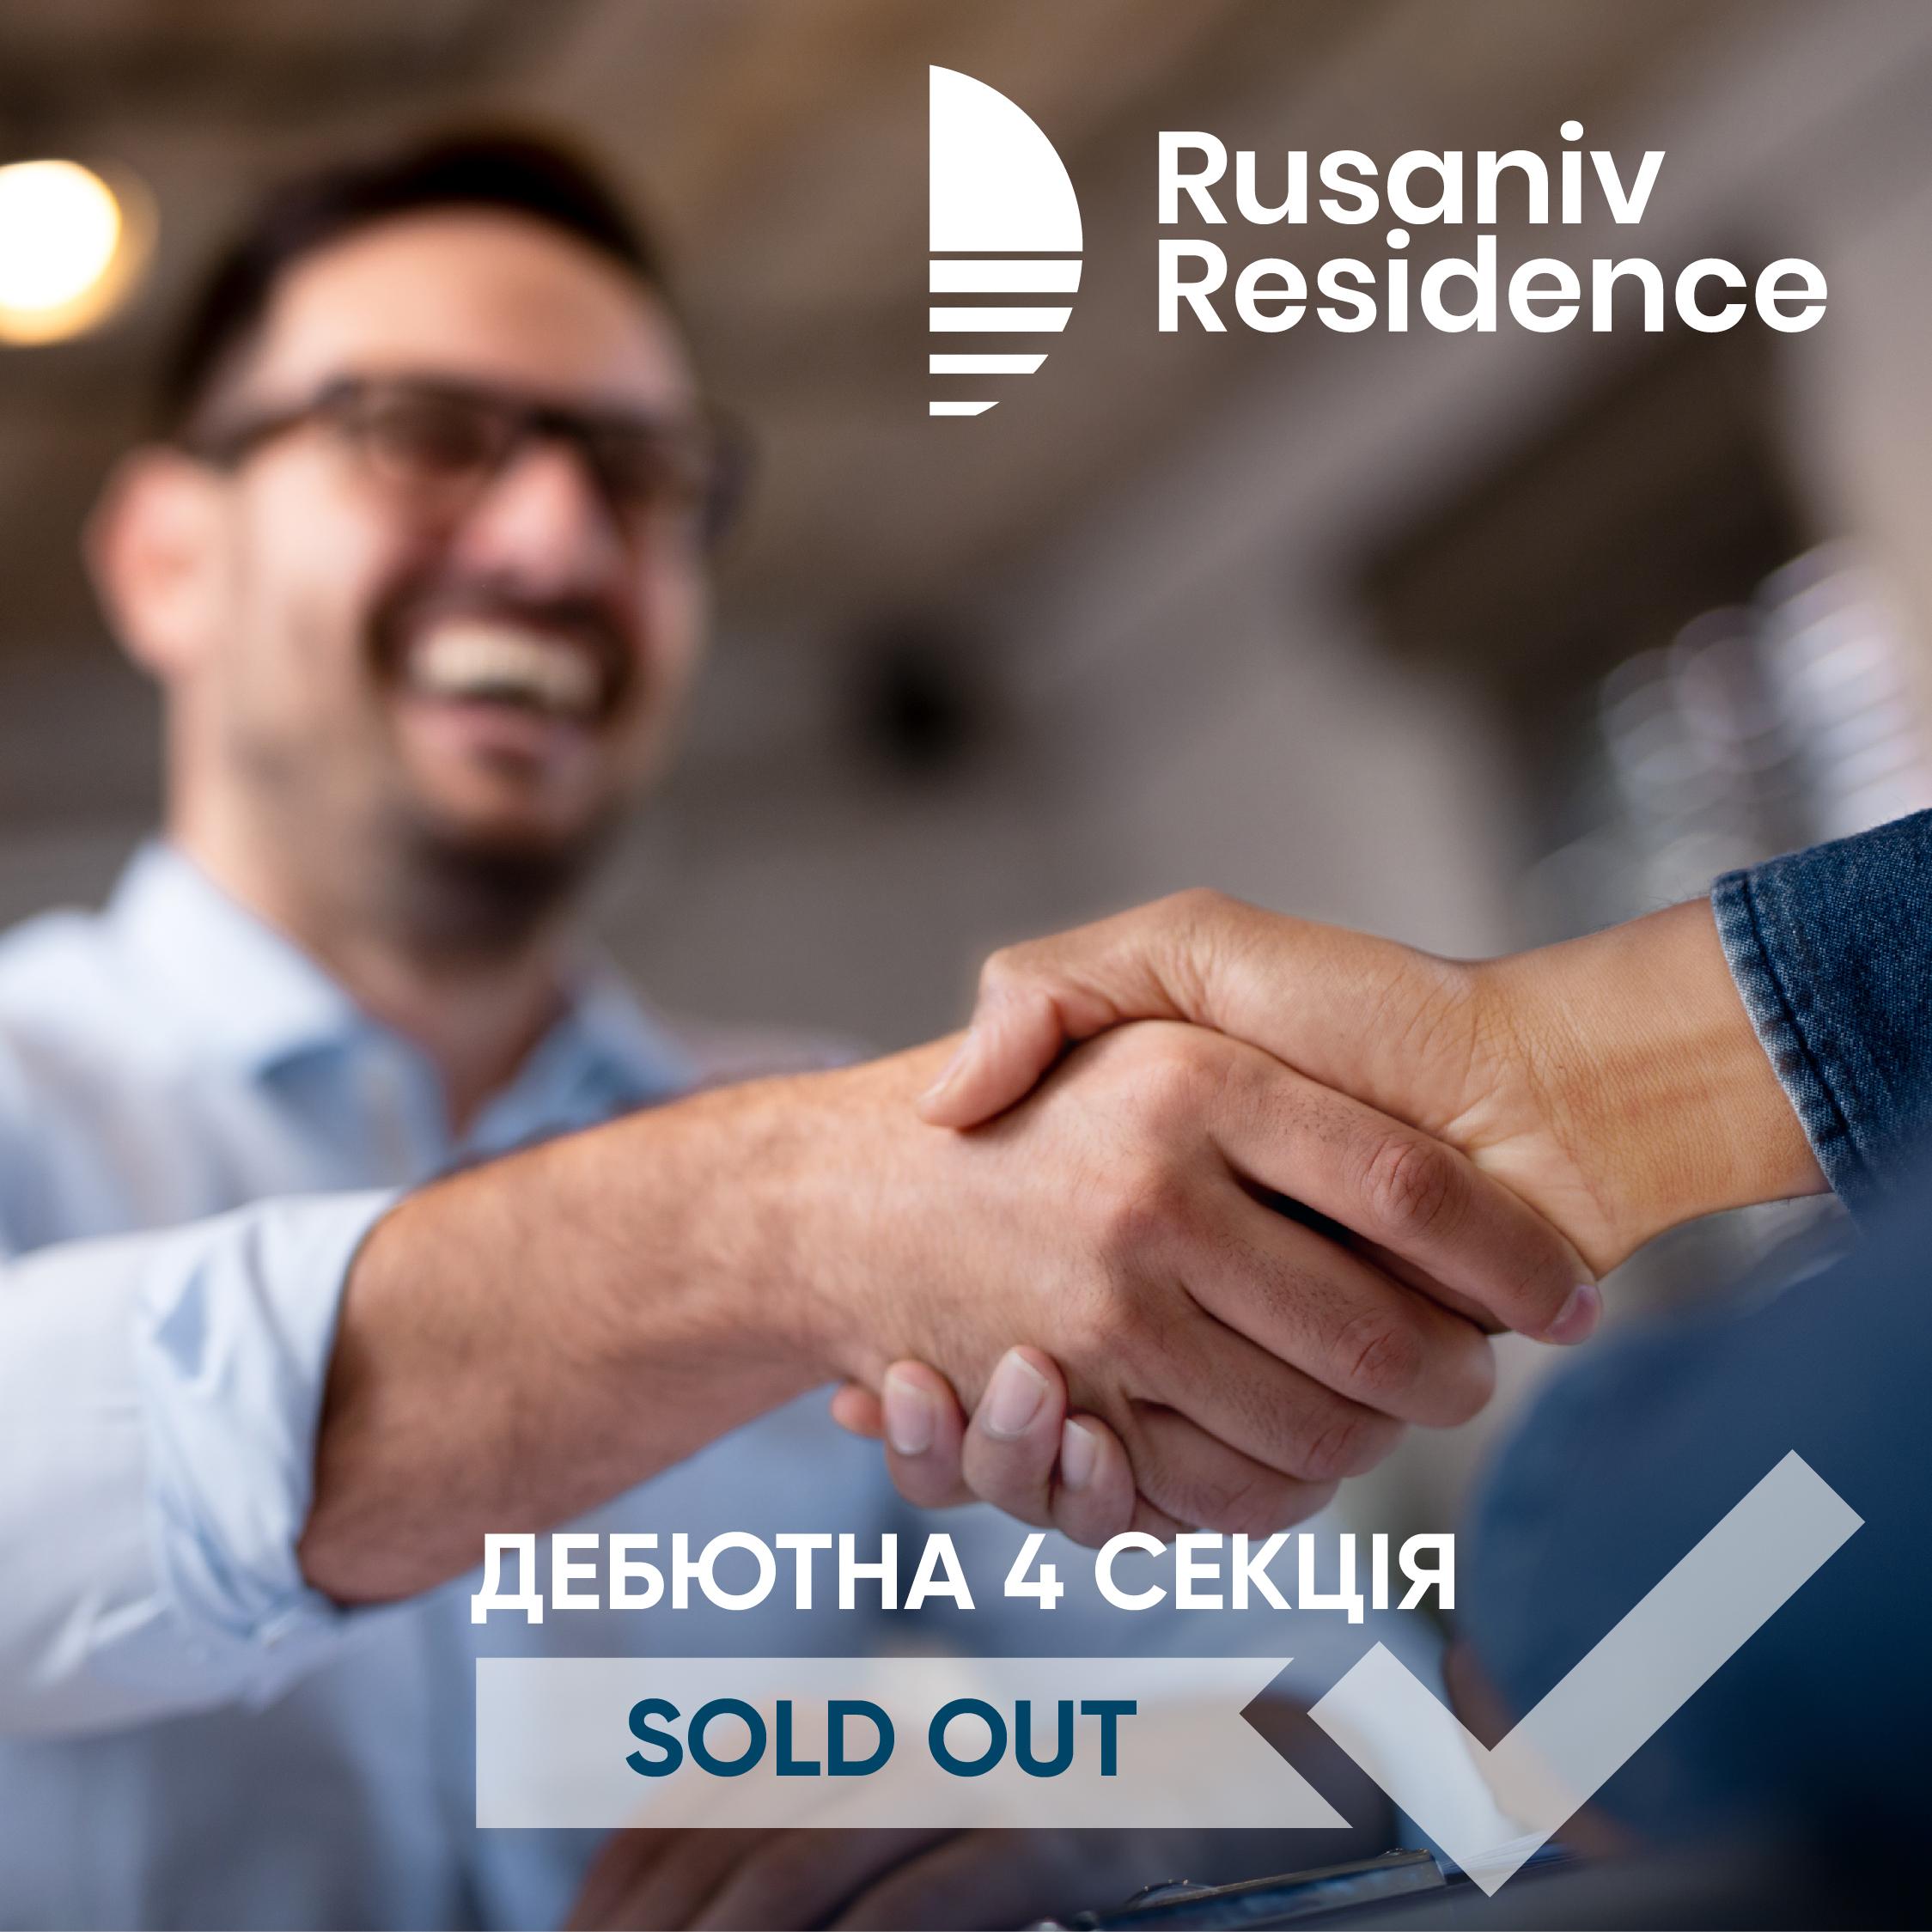 У дебютній секції Rusaniv Residence — Sold Out квартир